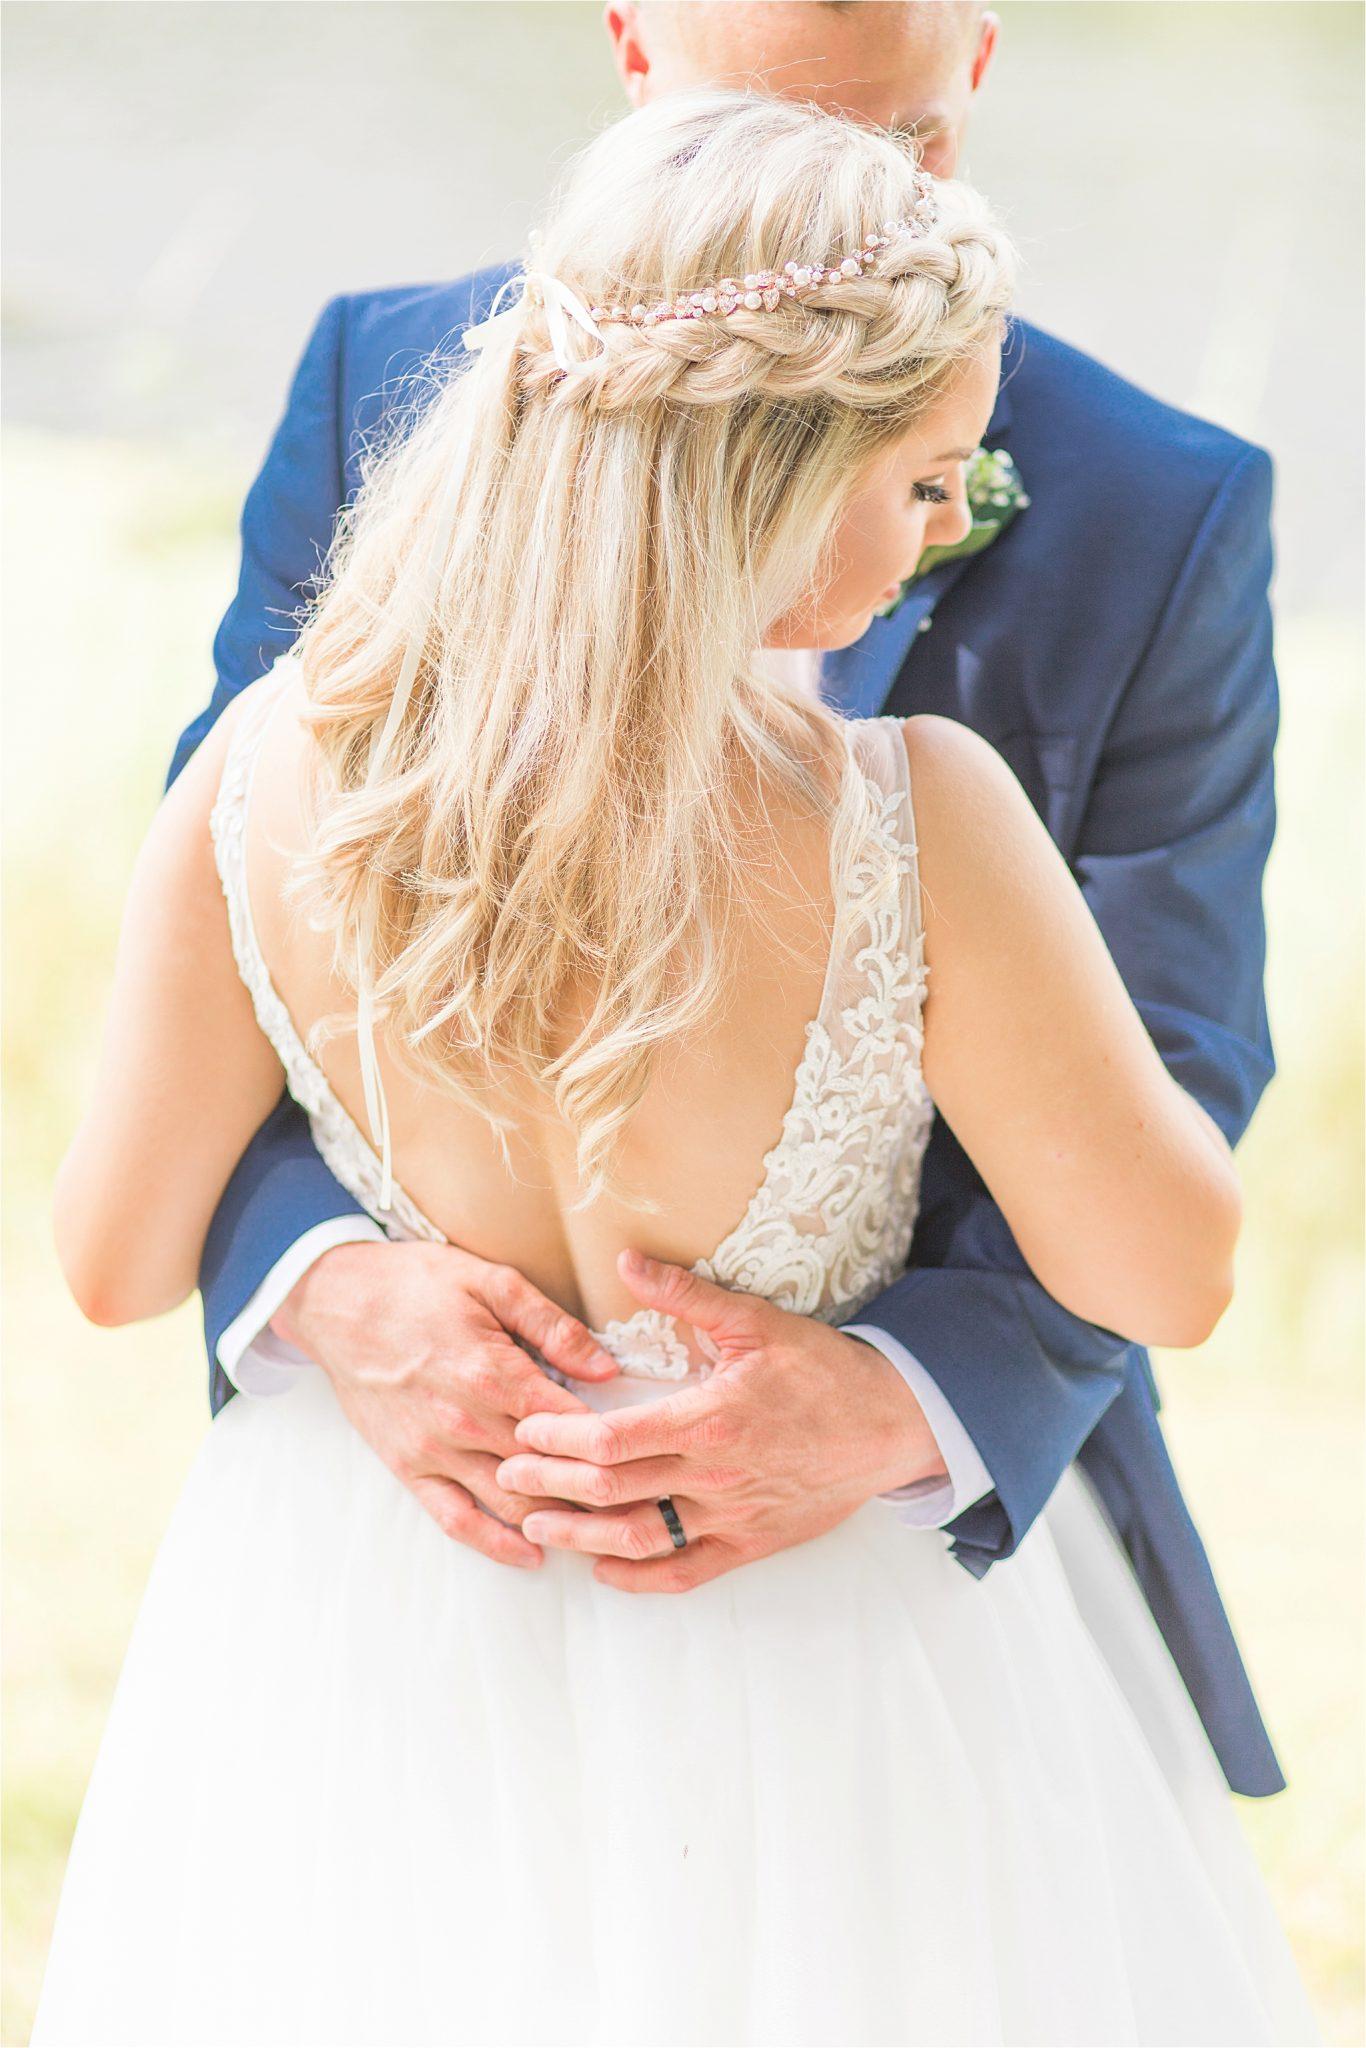 bridal-groom-portraits-photos-blue-suit-bow-tie-first-look-ideas-braided-hair